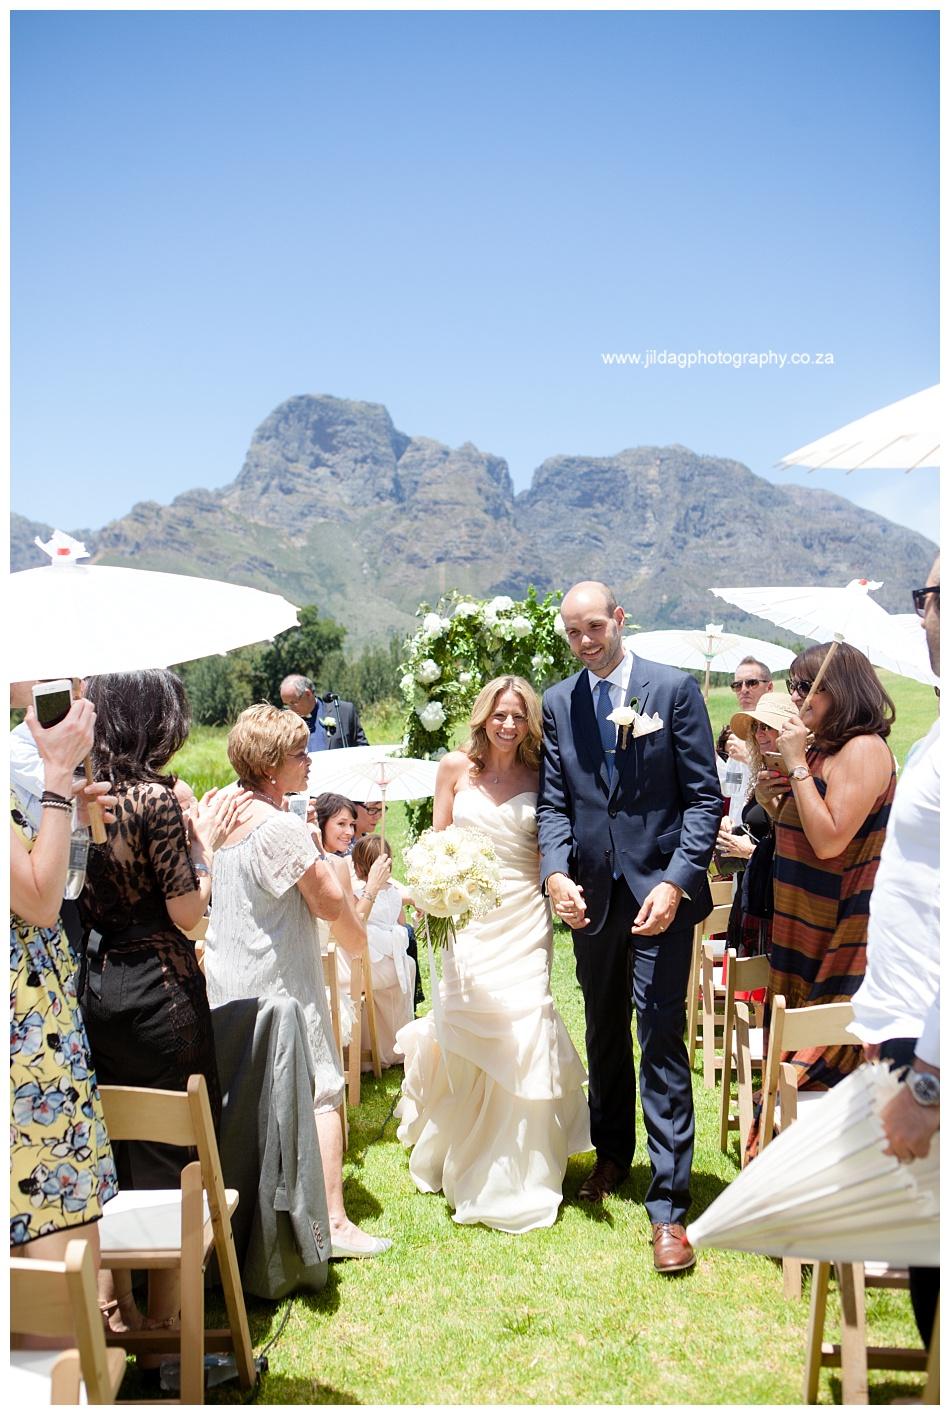 Jilda-G-Photography-Boschendal-wedding_1151